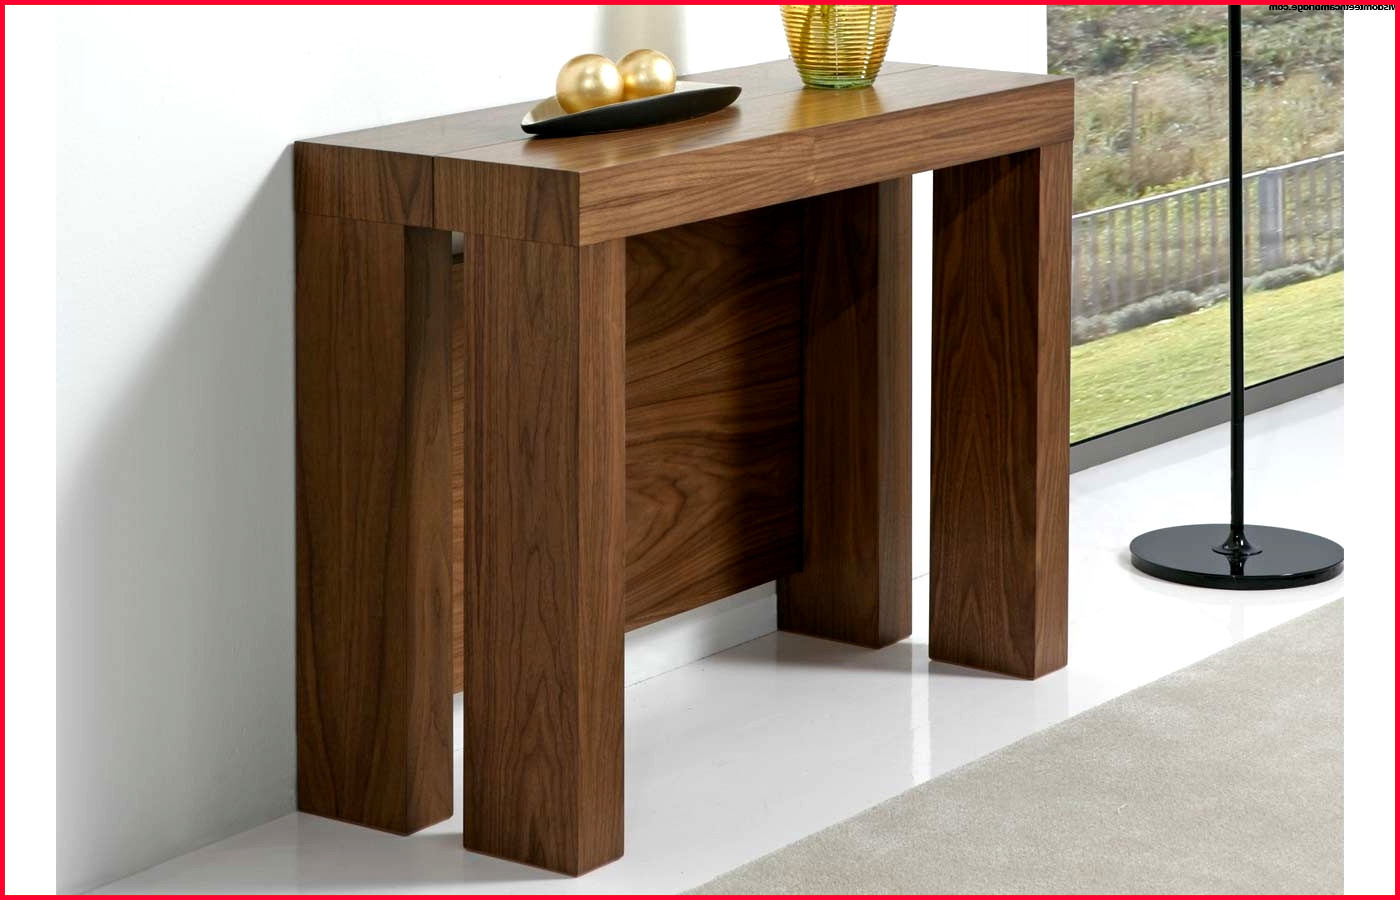 Mesa Salon Plegable Ipdd Mesa Salon Plegable Mesa Edor Plegable 5 Ideas Mesas De Salon